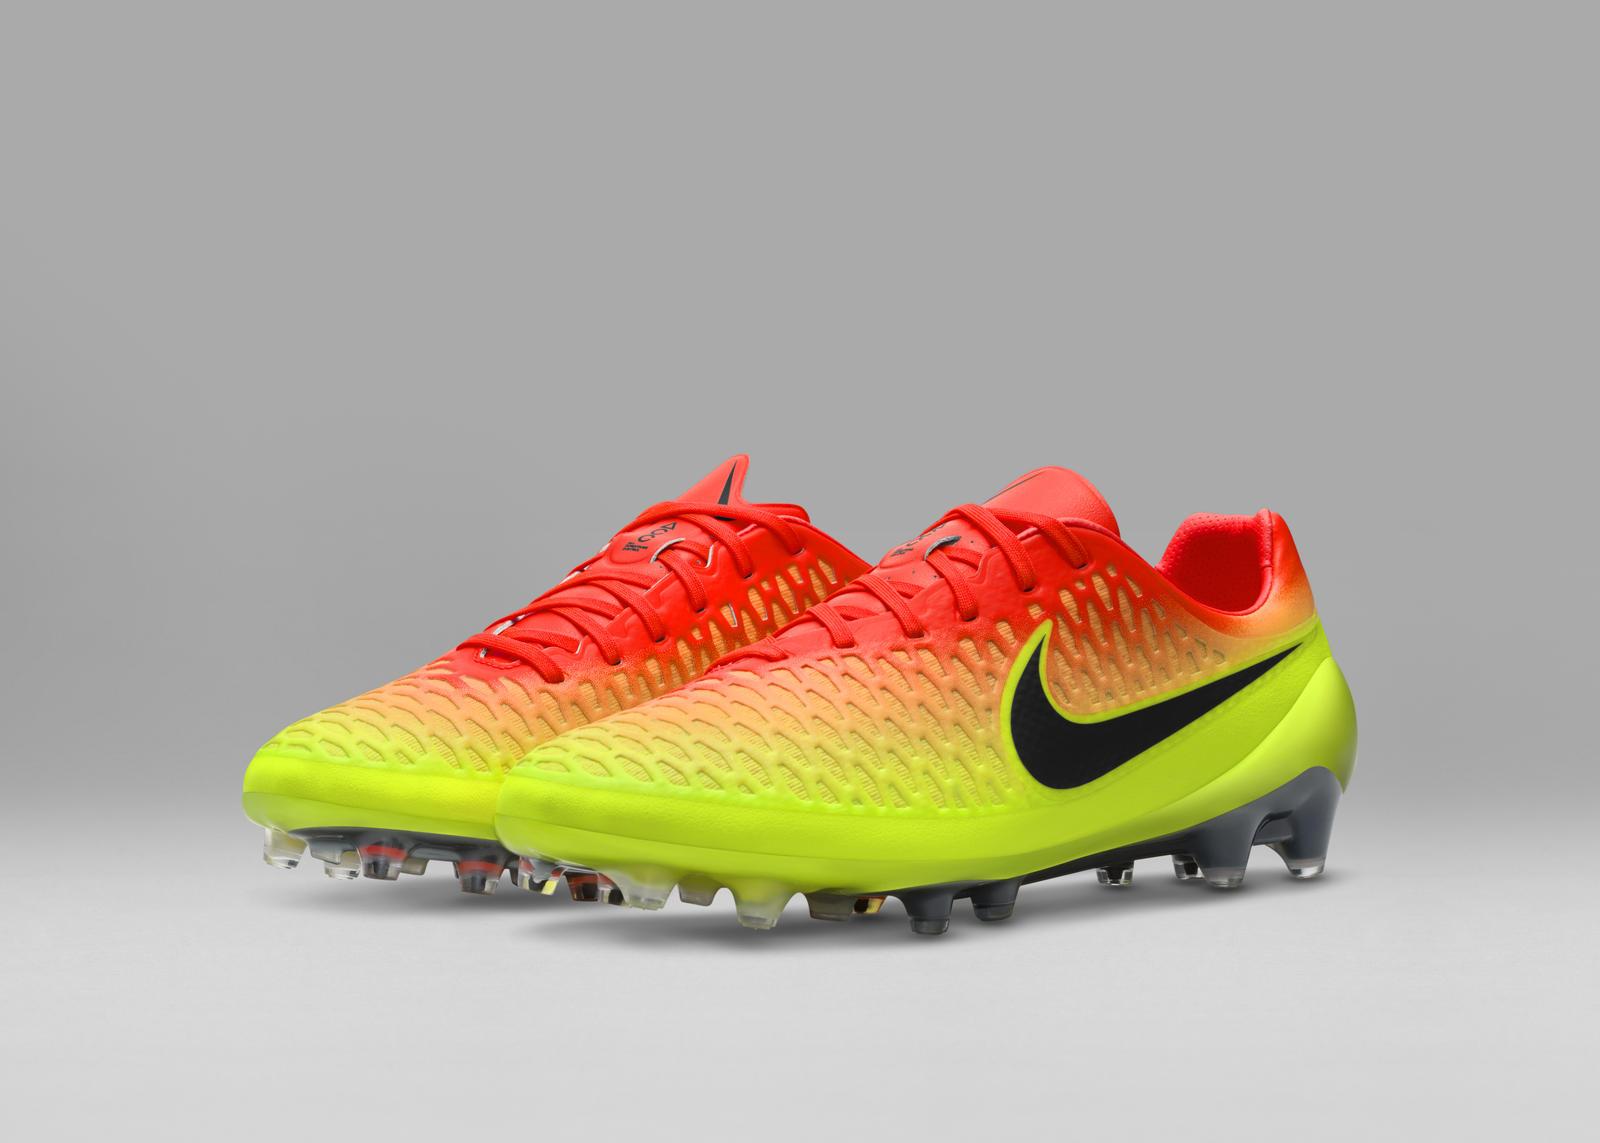 649230-807 E. Spark Brilliance Football Pack - Nike News. chaussure  football nike mercurial superfly ea sports 6a7a56c000f3